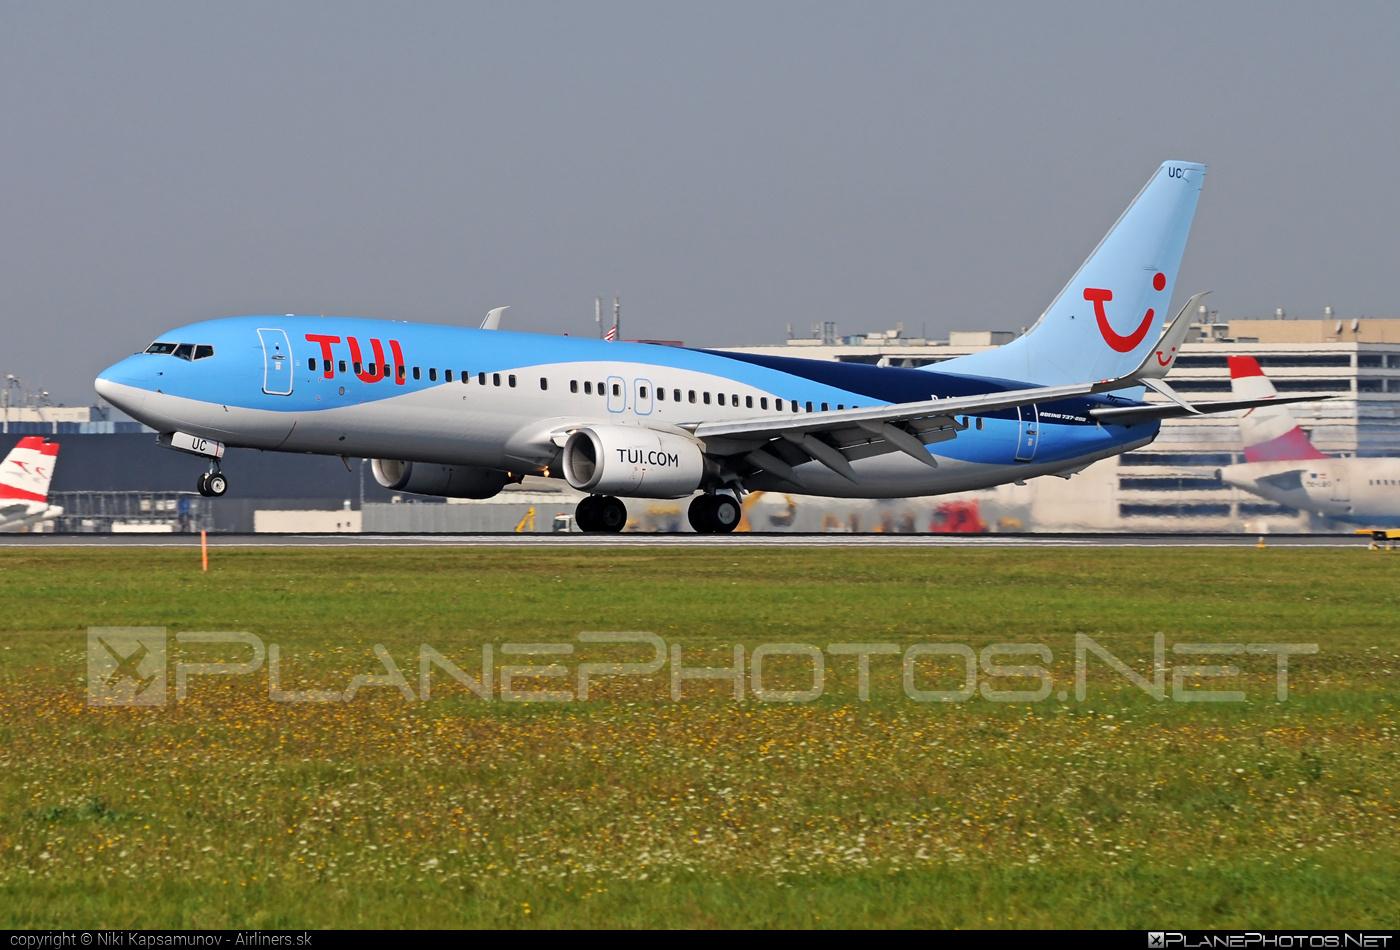 Boeing 737-800 - D-ATUC operated by TUIfly #b737 #b737nextgen #b737ng #boeing #boeing737 #tui #tuifly